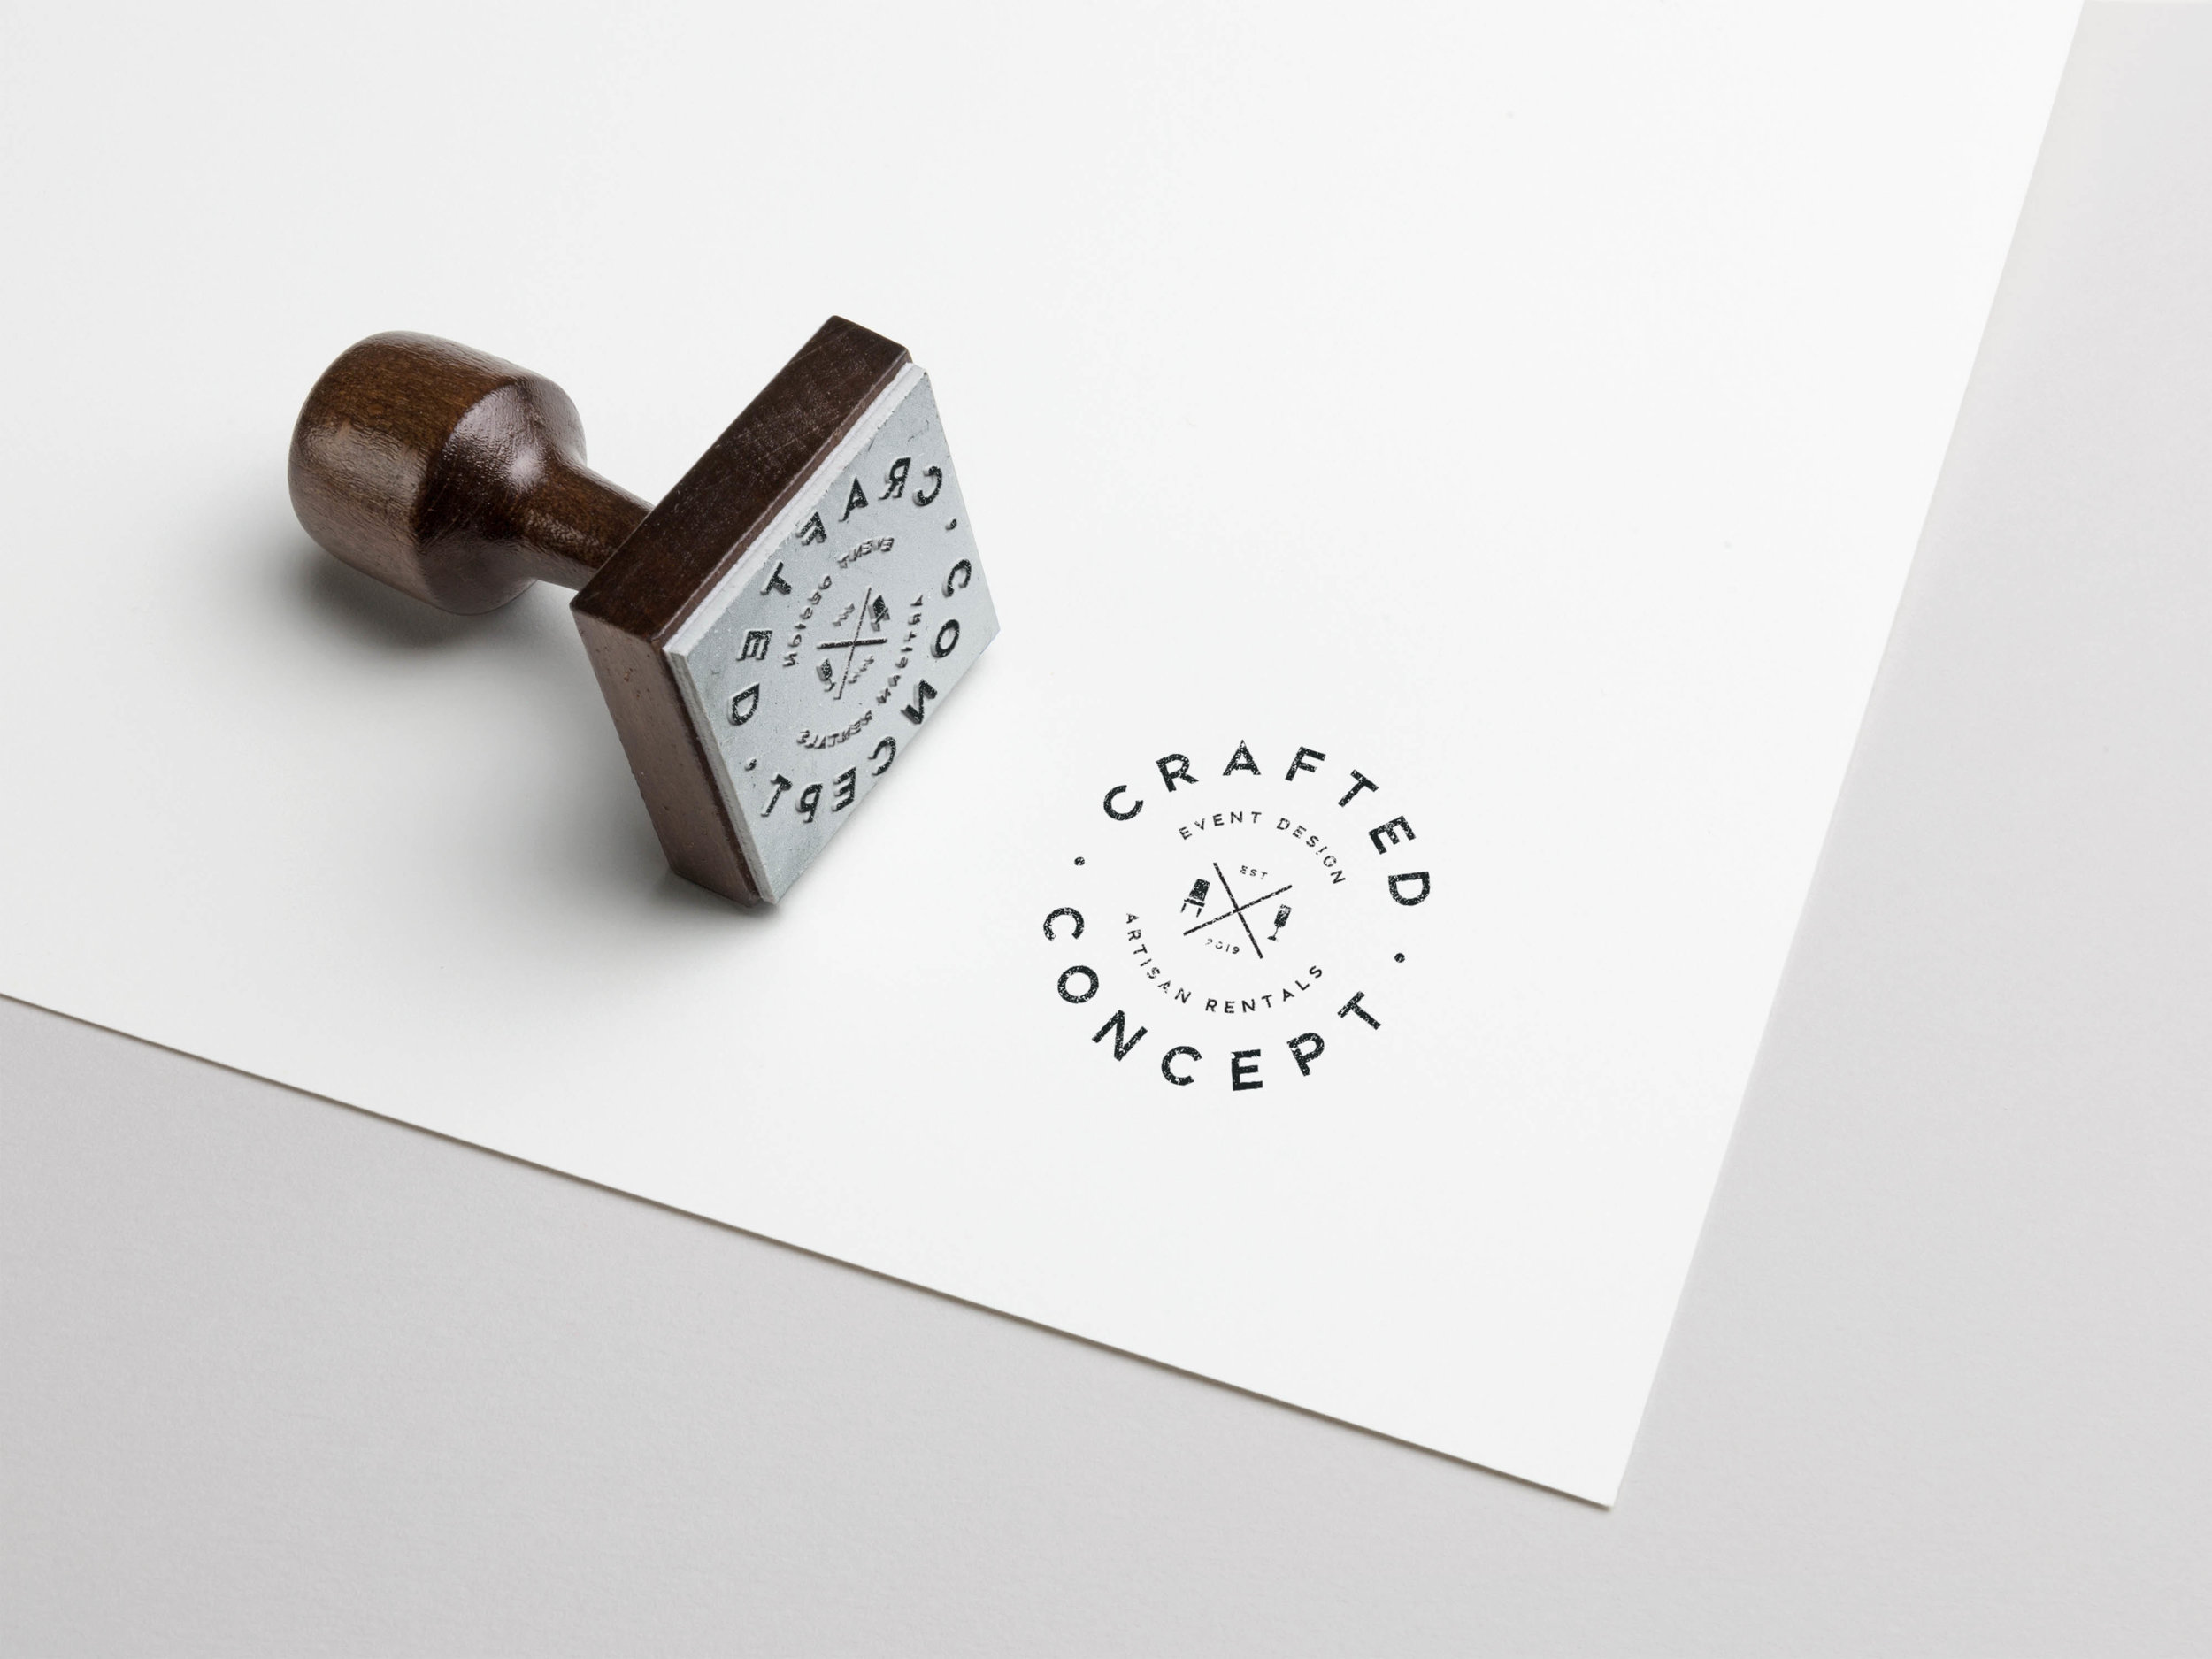 Rubber Stamp2.jpg